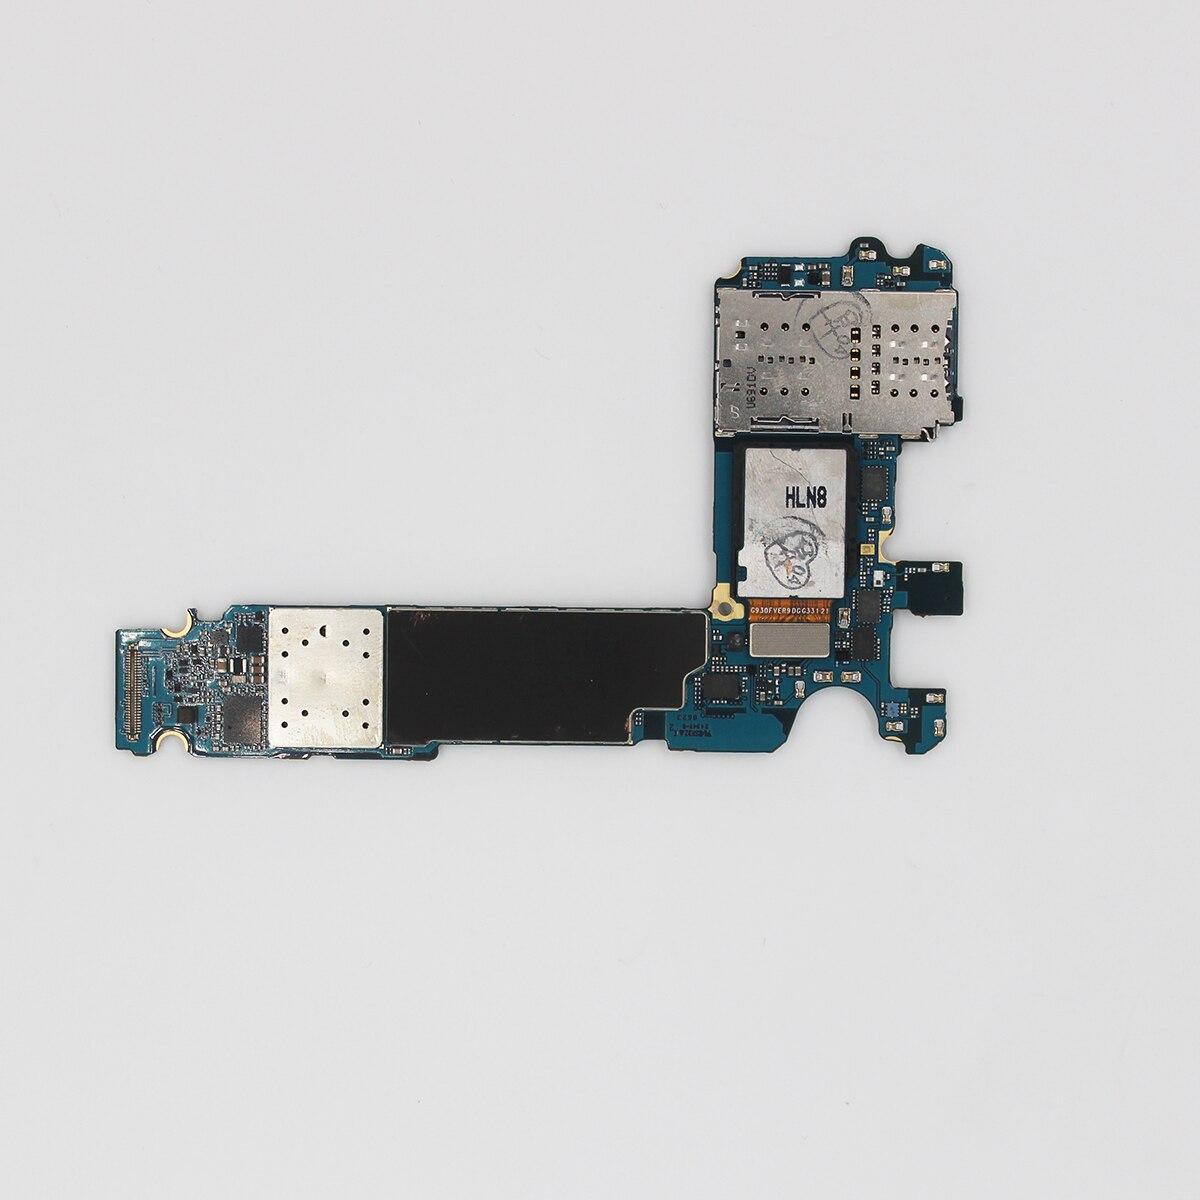 Tigenkey For Samsung Galaxy S7 Edge G935fd Mainboard Original Working 100 Test Free Shipping Unlocked Motherboard Mobile Phone Circuits Aliexpress